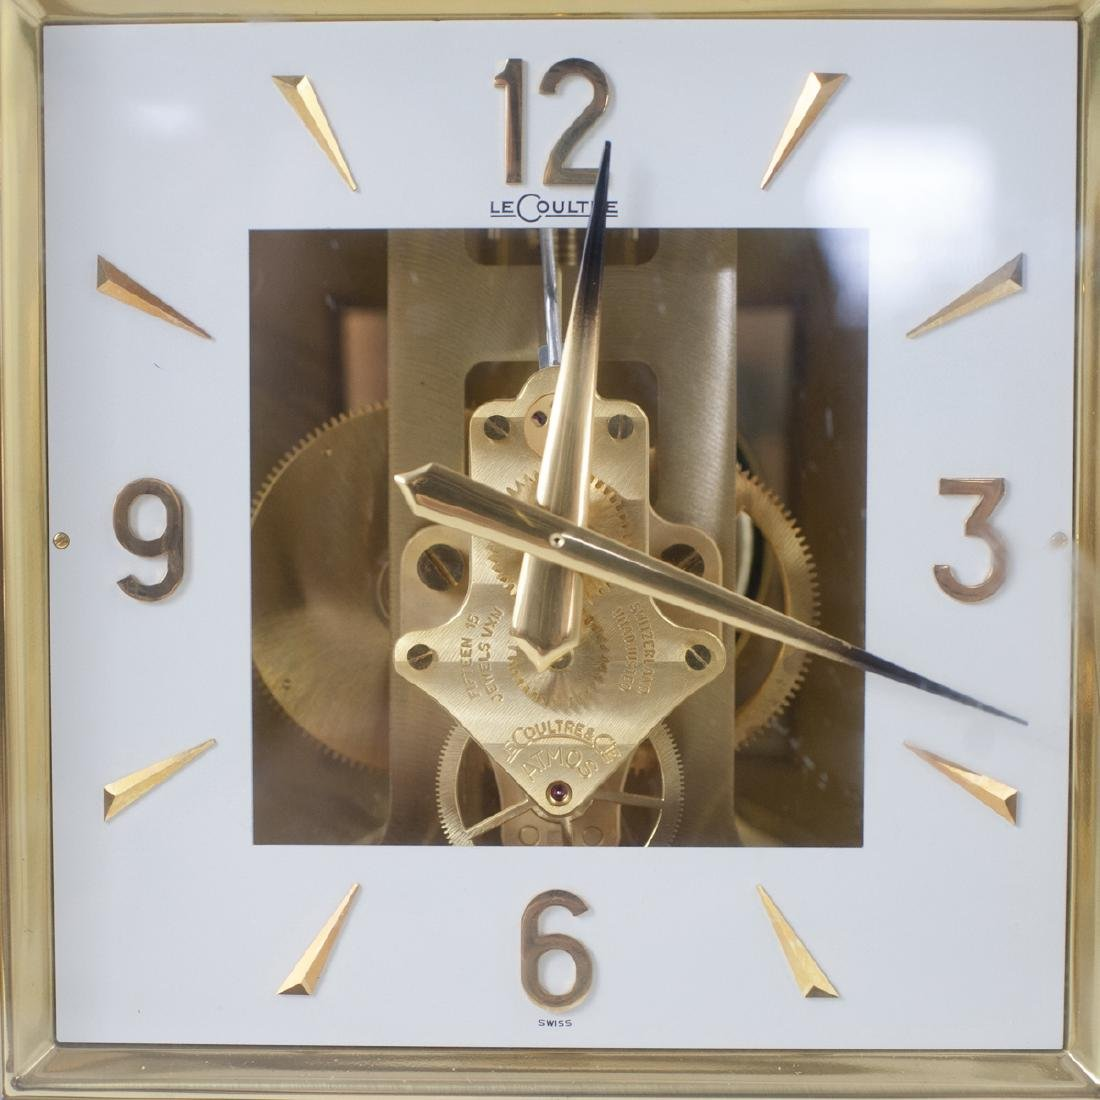 Jaeger LeCoultre Brass Atmos Clock - 2